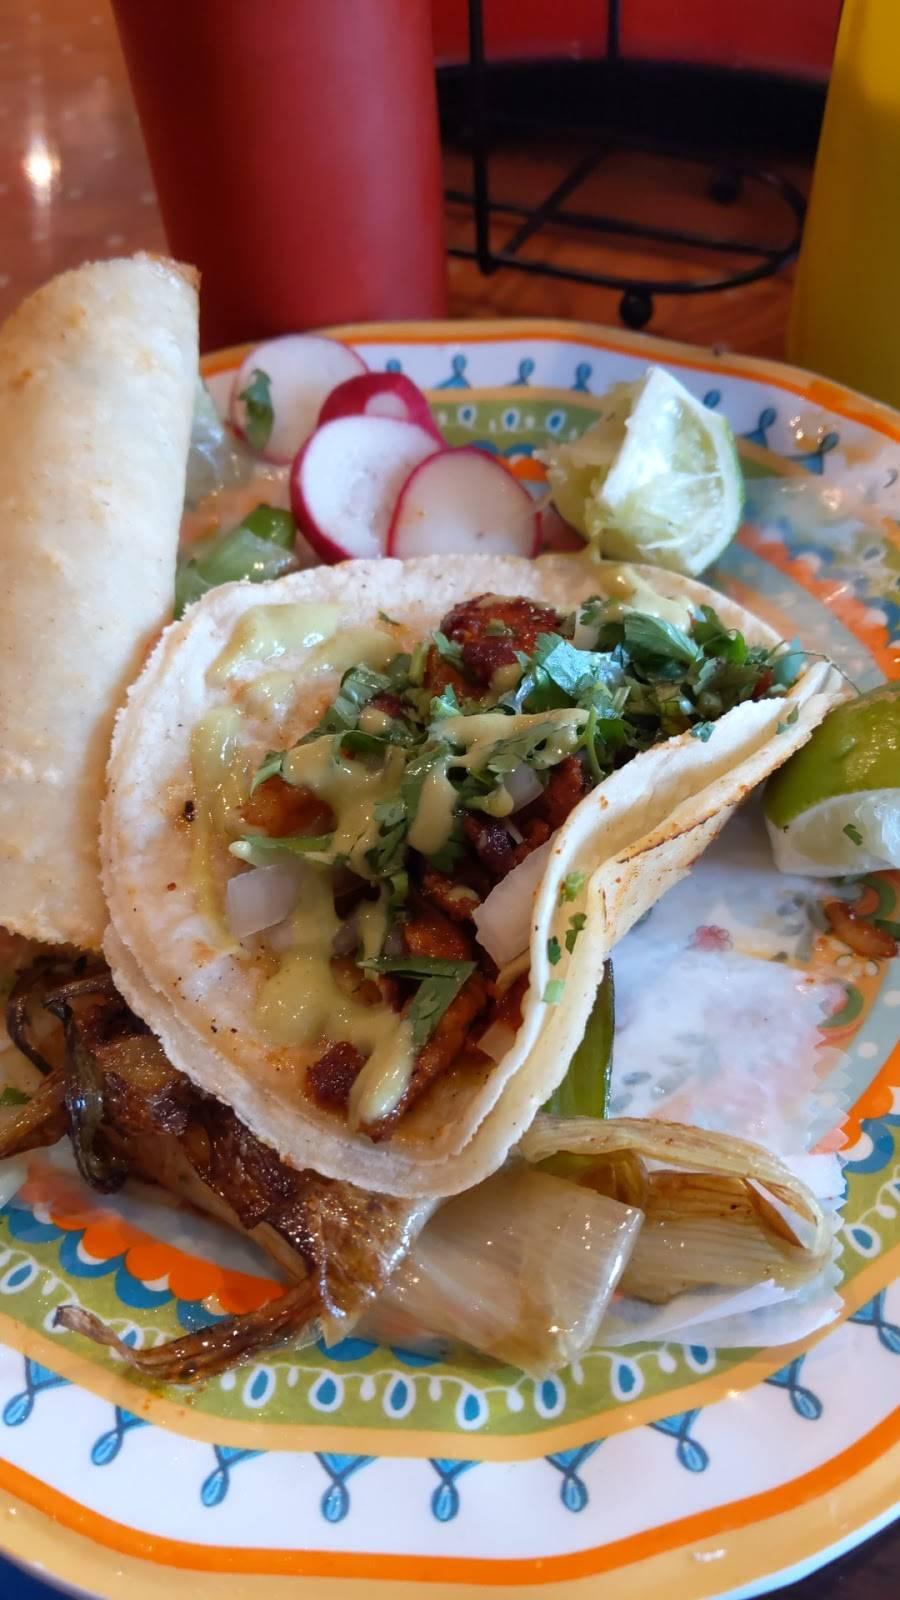 Jalapeño Restaurant | restaurant | 308a N Main St, Spring Valley, NY 10977, USA